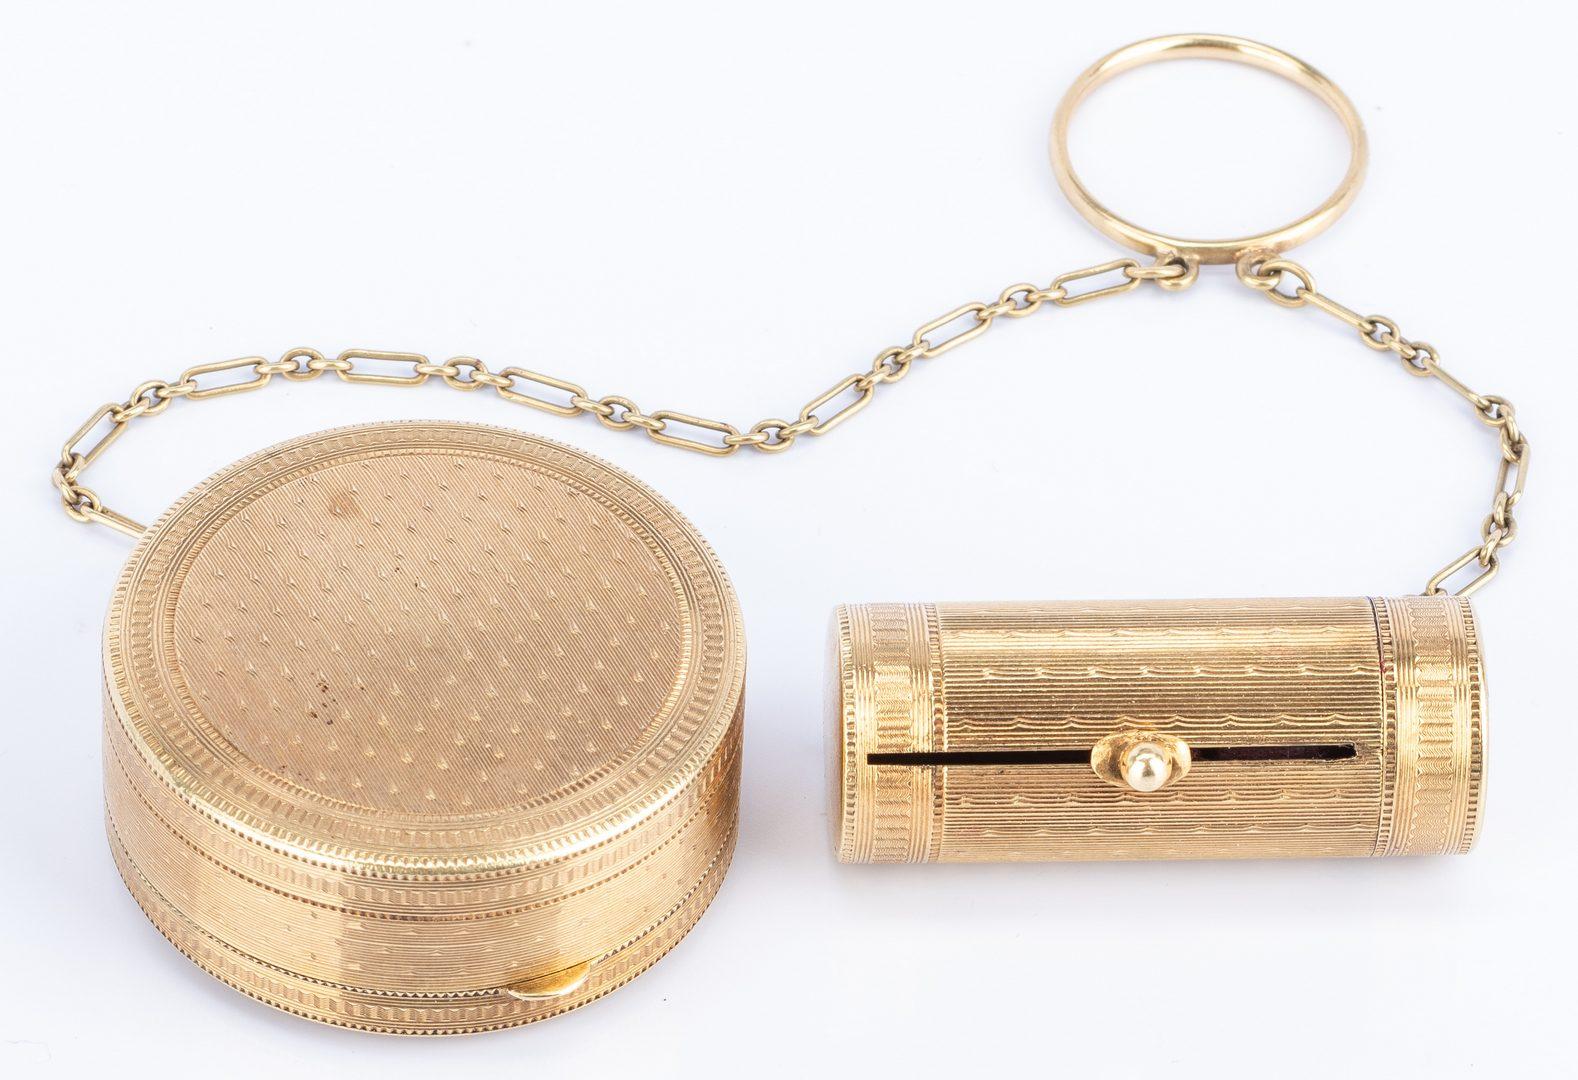 Lot 39: 14k Chatelaine Compact Lipstick Case